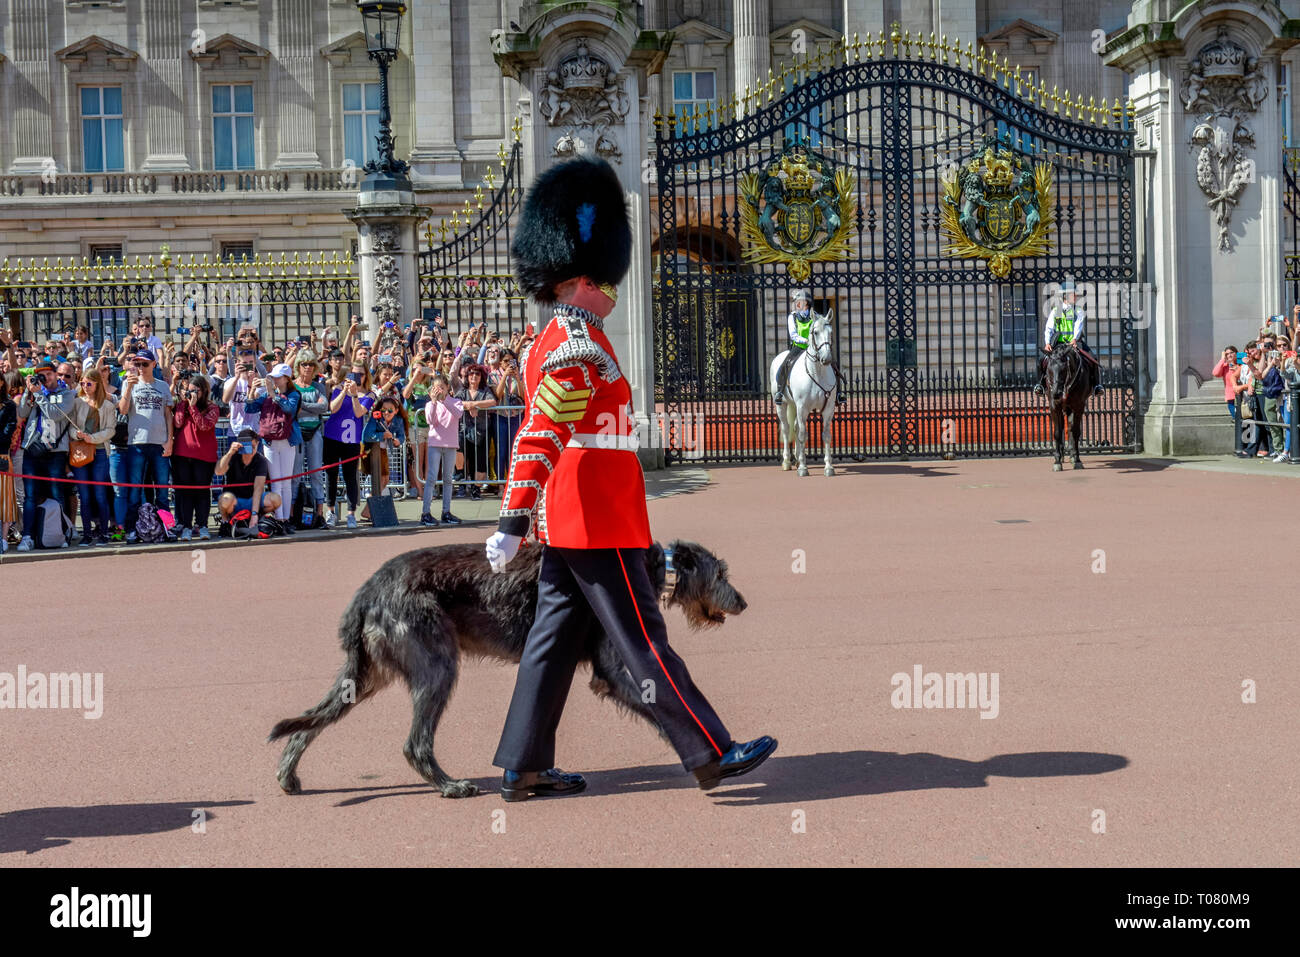 Queen's Guards, Maskottchen Irish Wolfshound, Changing of the guards, Buckingham Palace, London, England, Grossbritannien Stock Photo